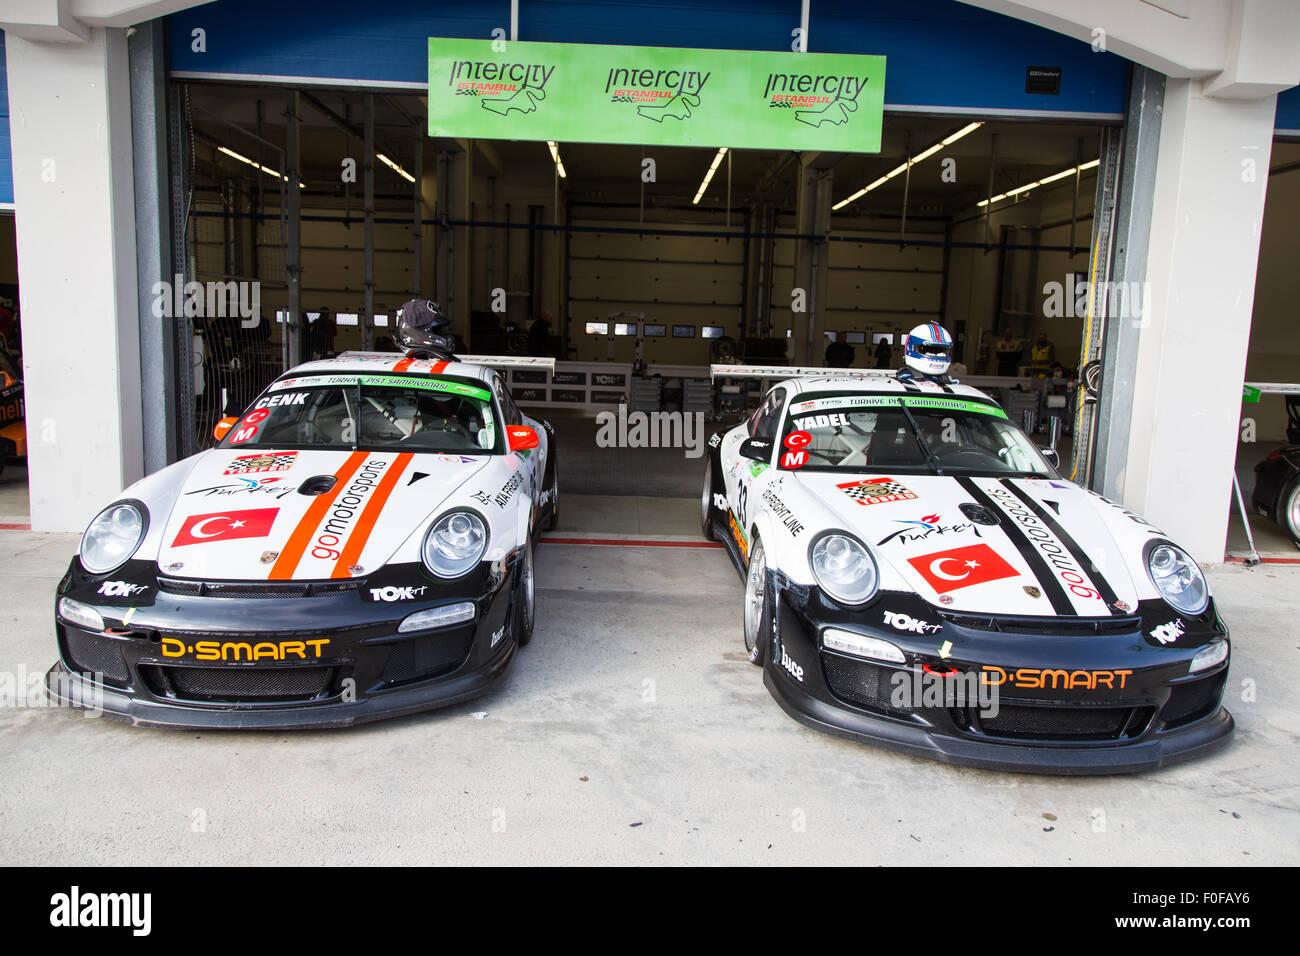 ISTANBUL, TURKEY - NOVEMBER 02, 2014: Go Motorsports team cars in Pit lane during Turkish Touring Car Championship - Stock Image